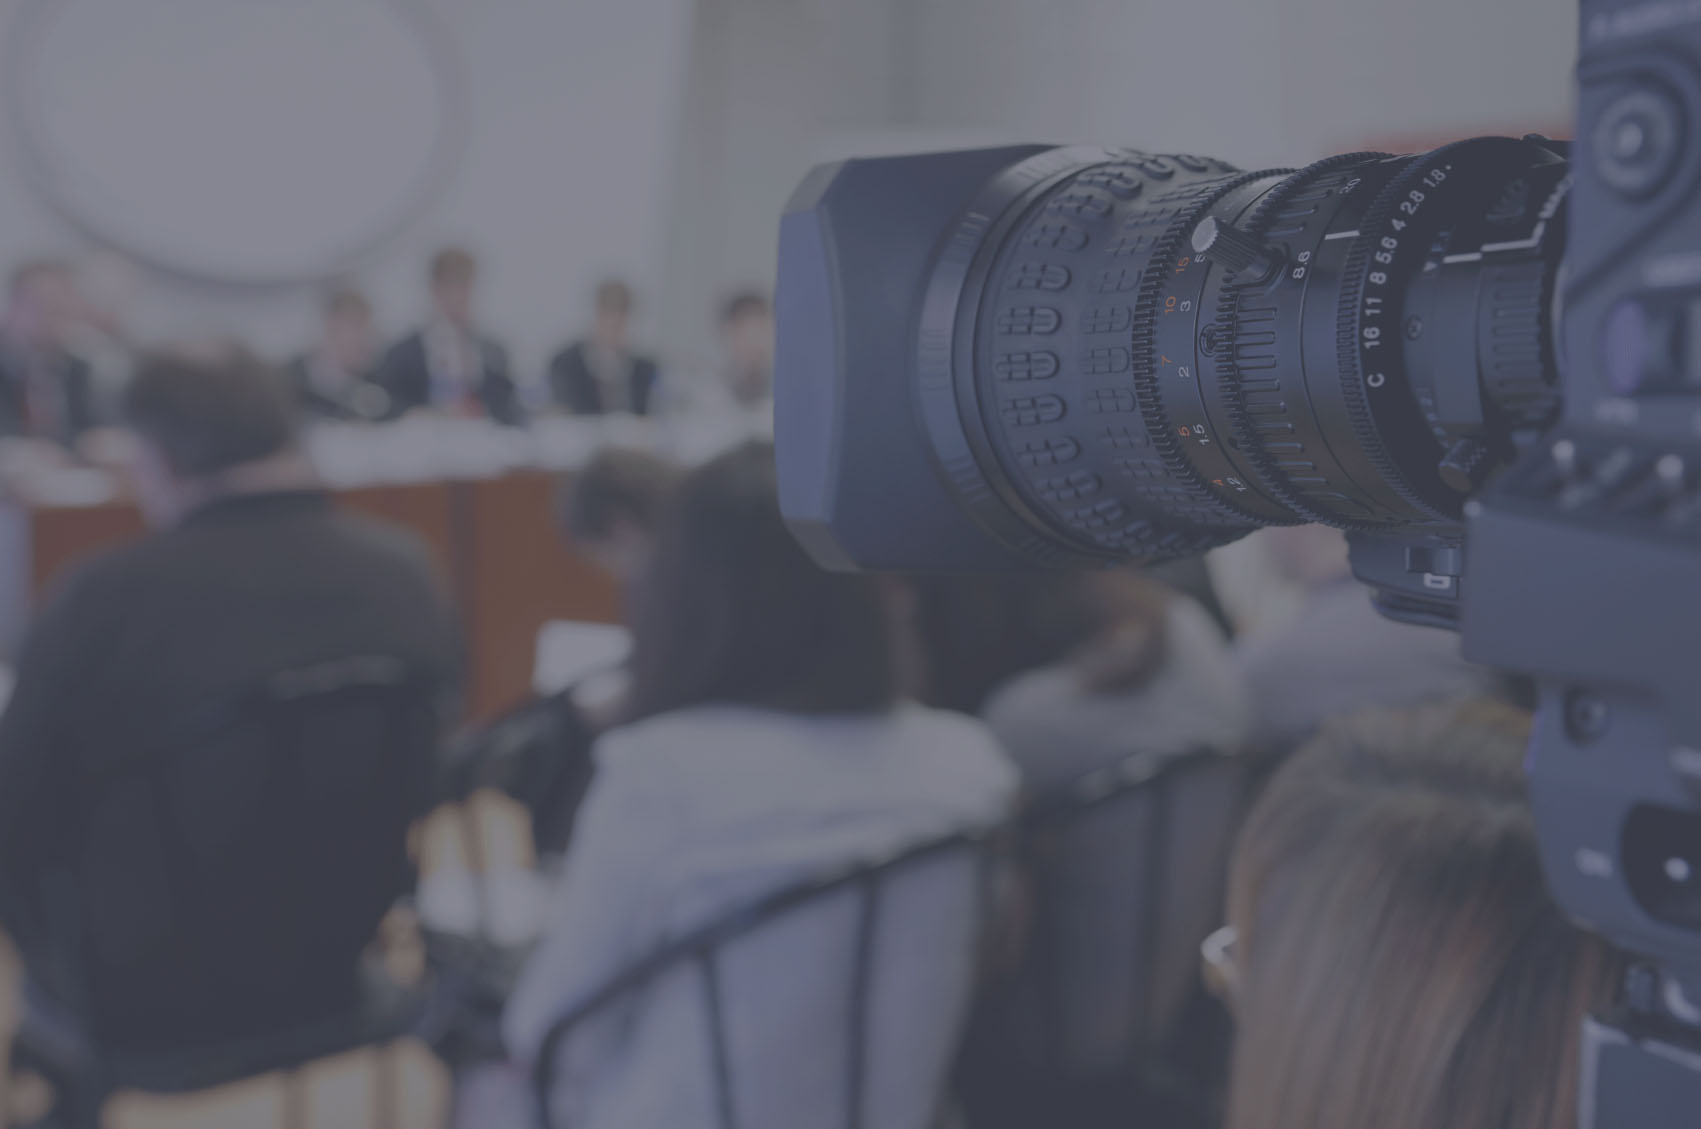 Live Expert Panel with Participants via Skype